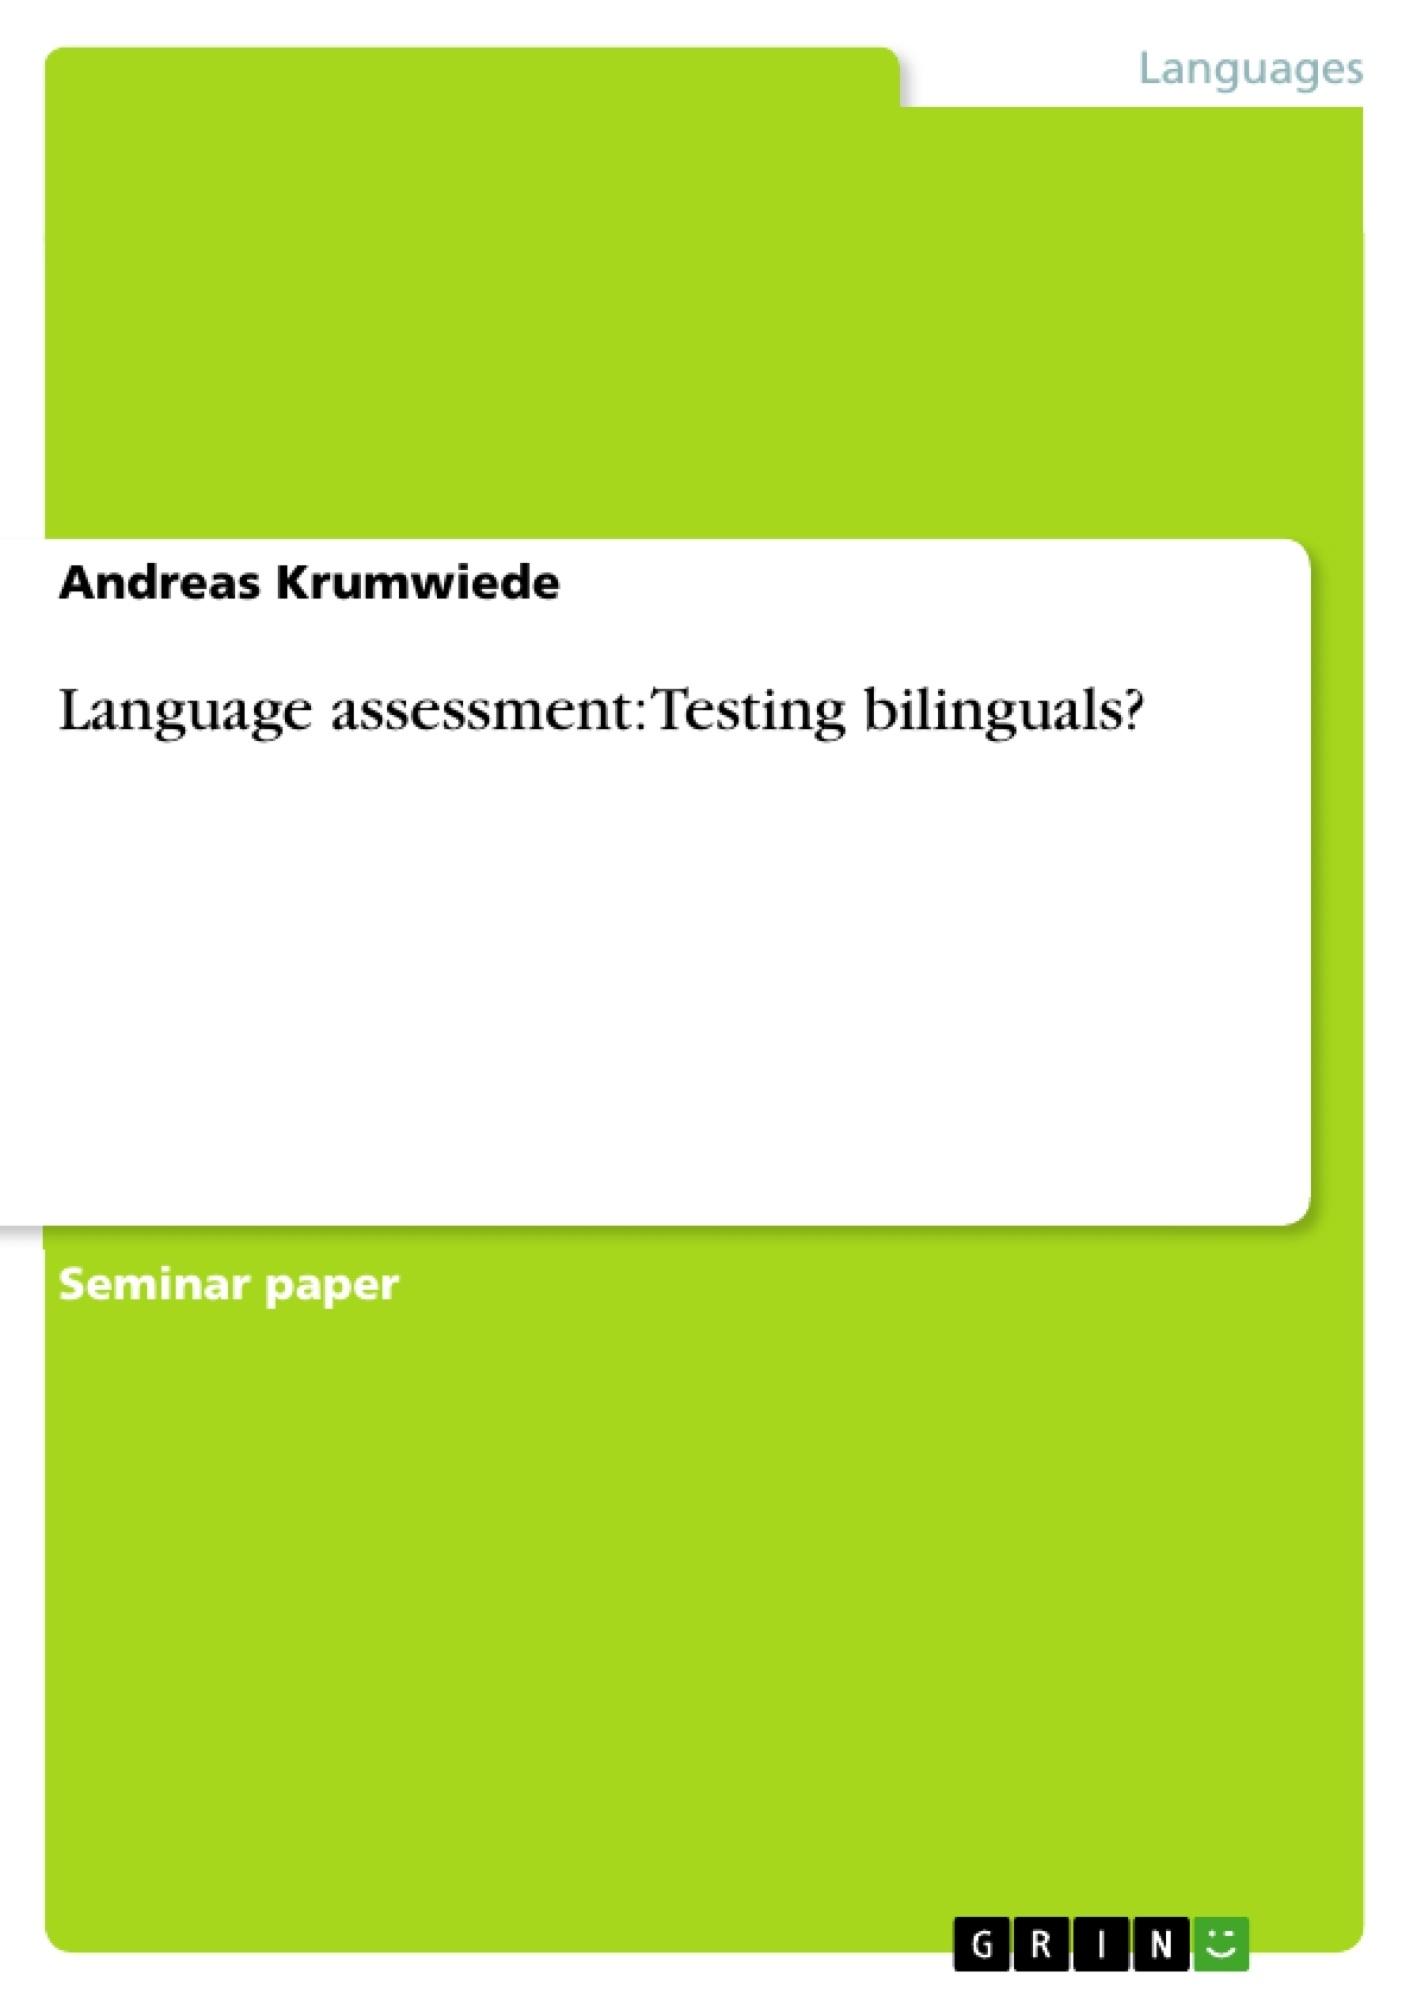 Title: Language assessment: Testing bilinguals?